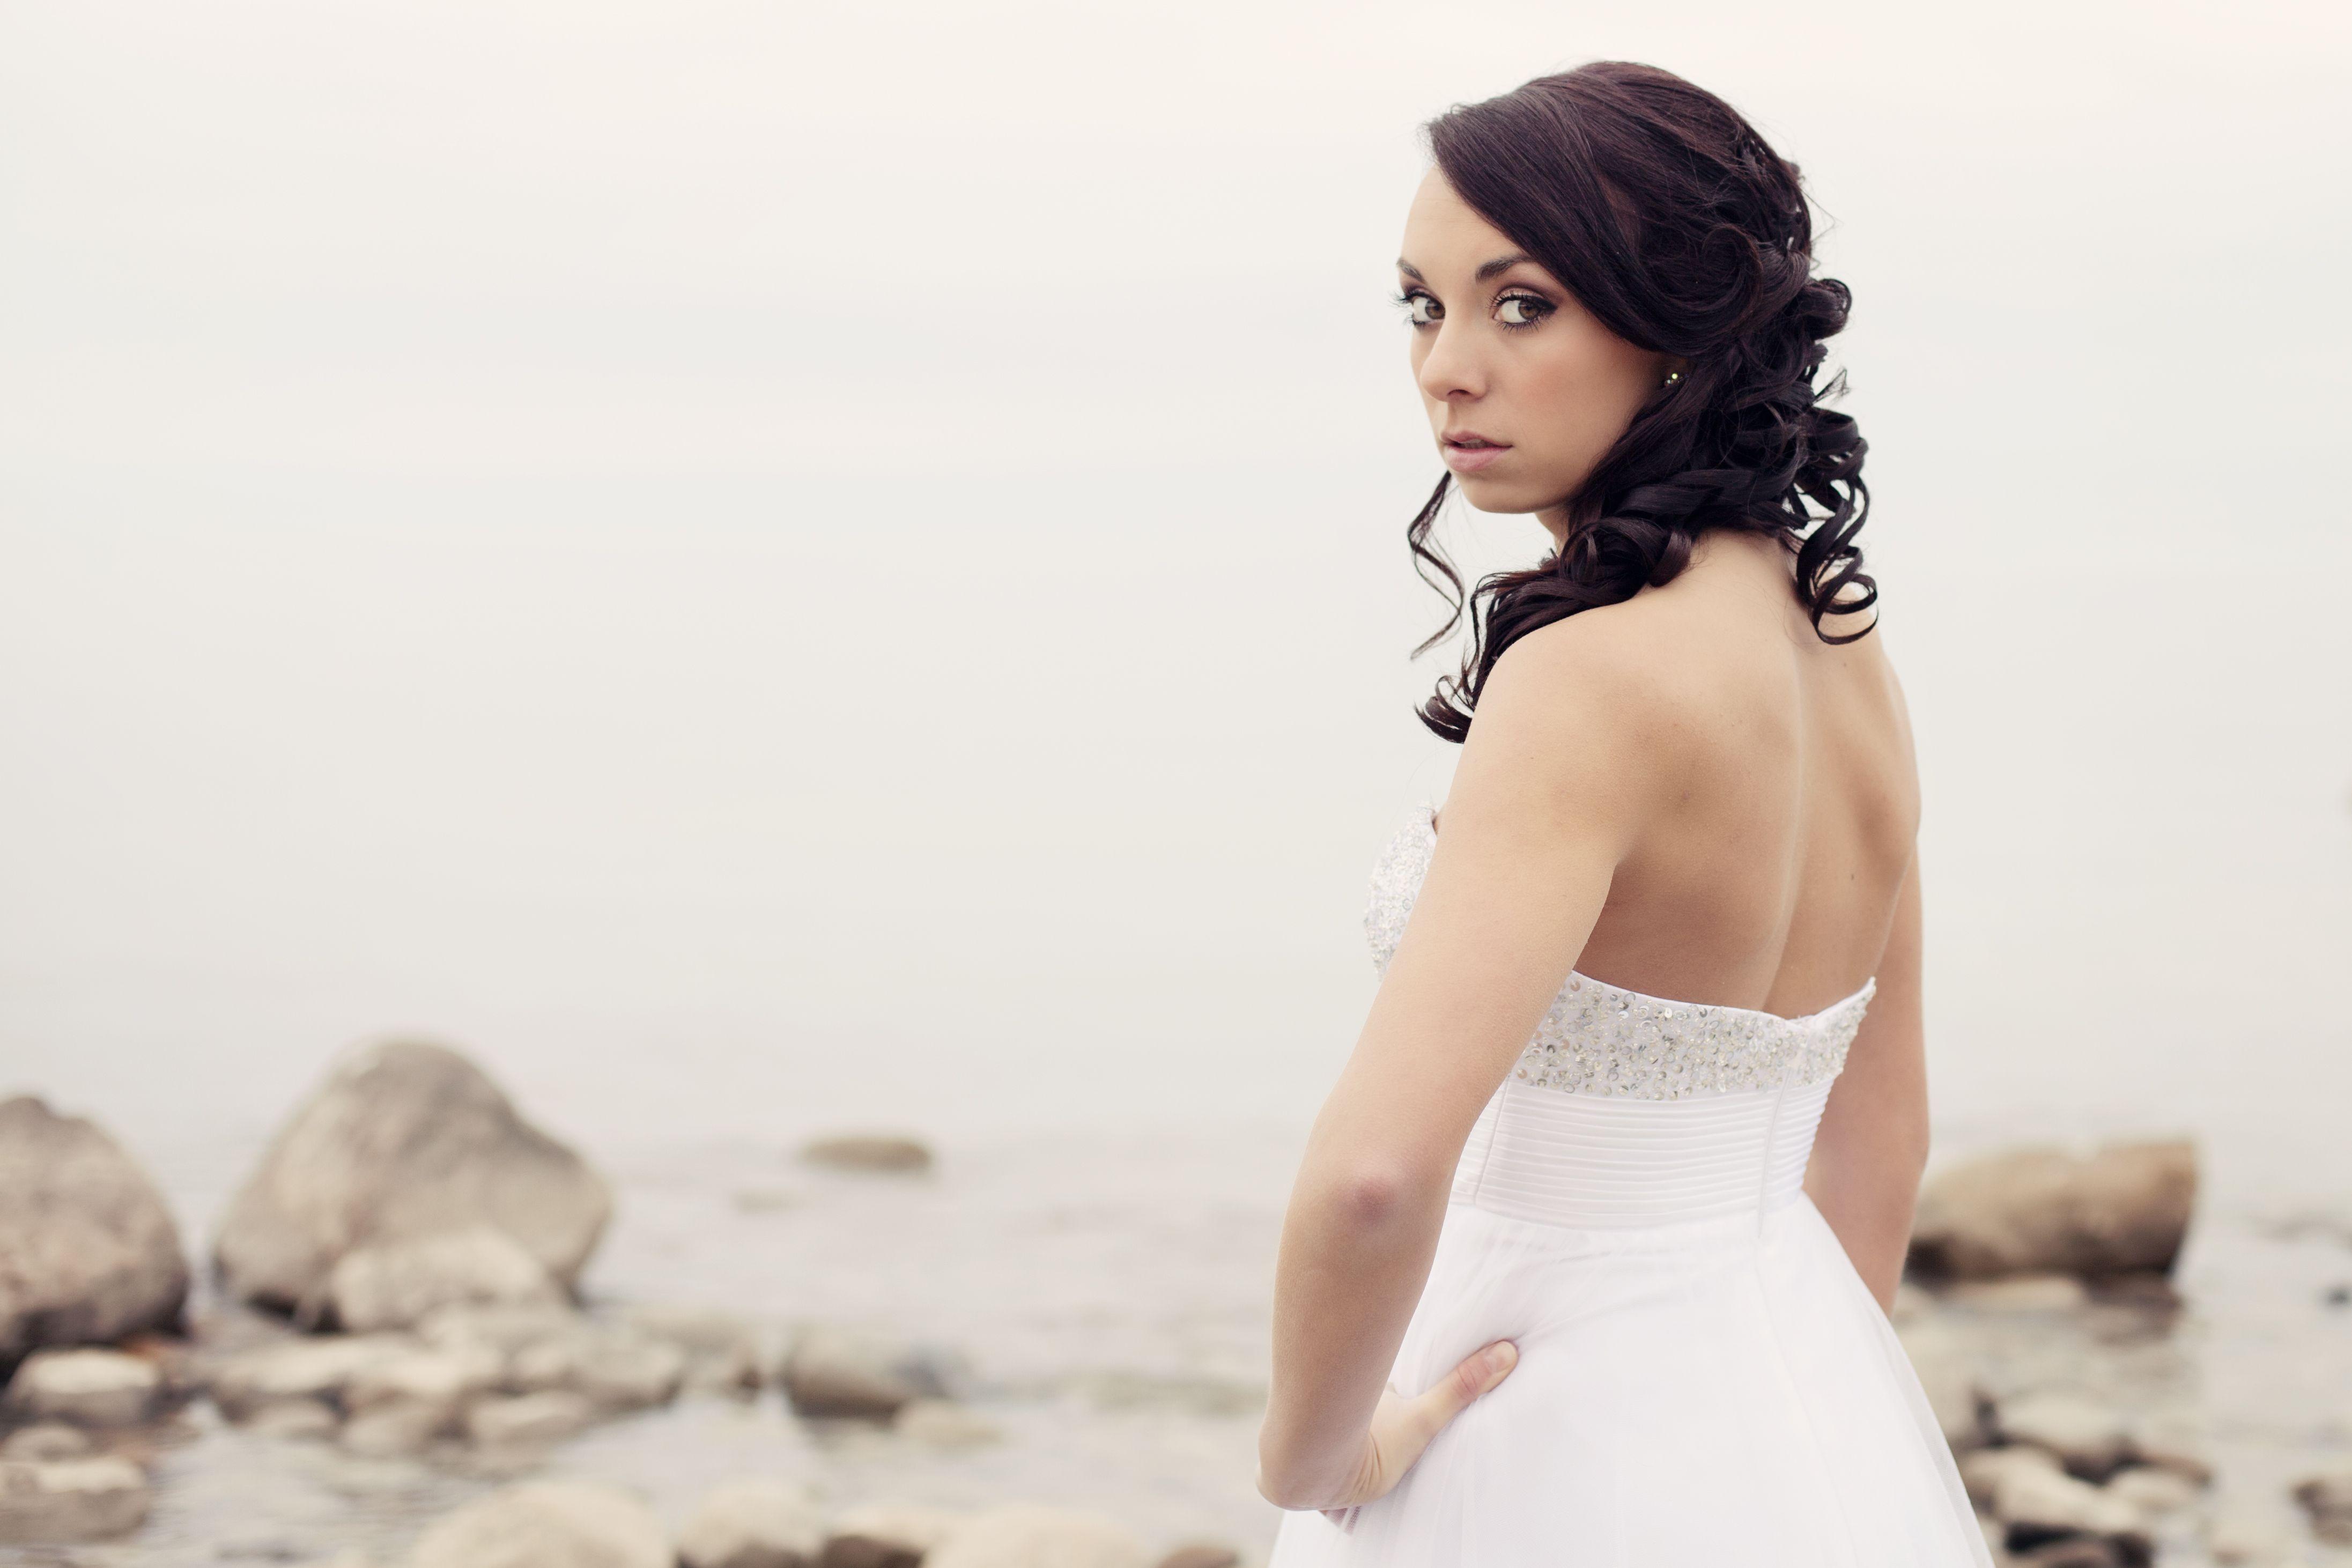 Hair by: Megan Ganley @ HG Salon  Make up by: Ashleigh Bolt @HG Salon  Photography by: Dani Lynn Photography, Croswell MI